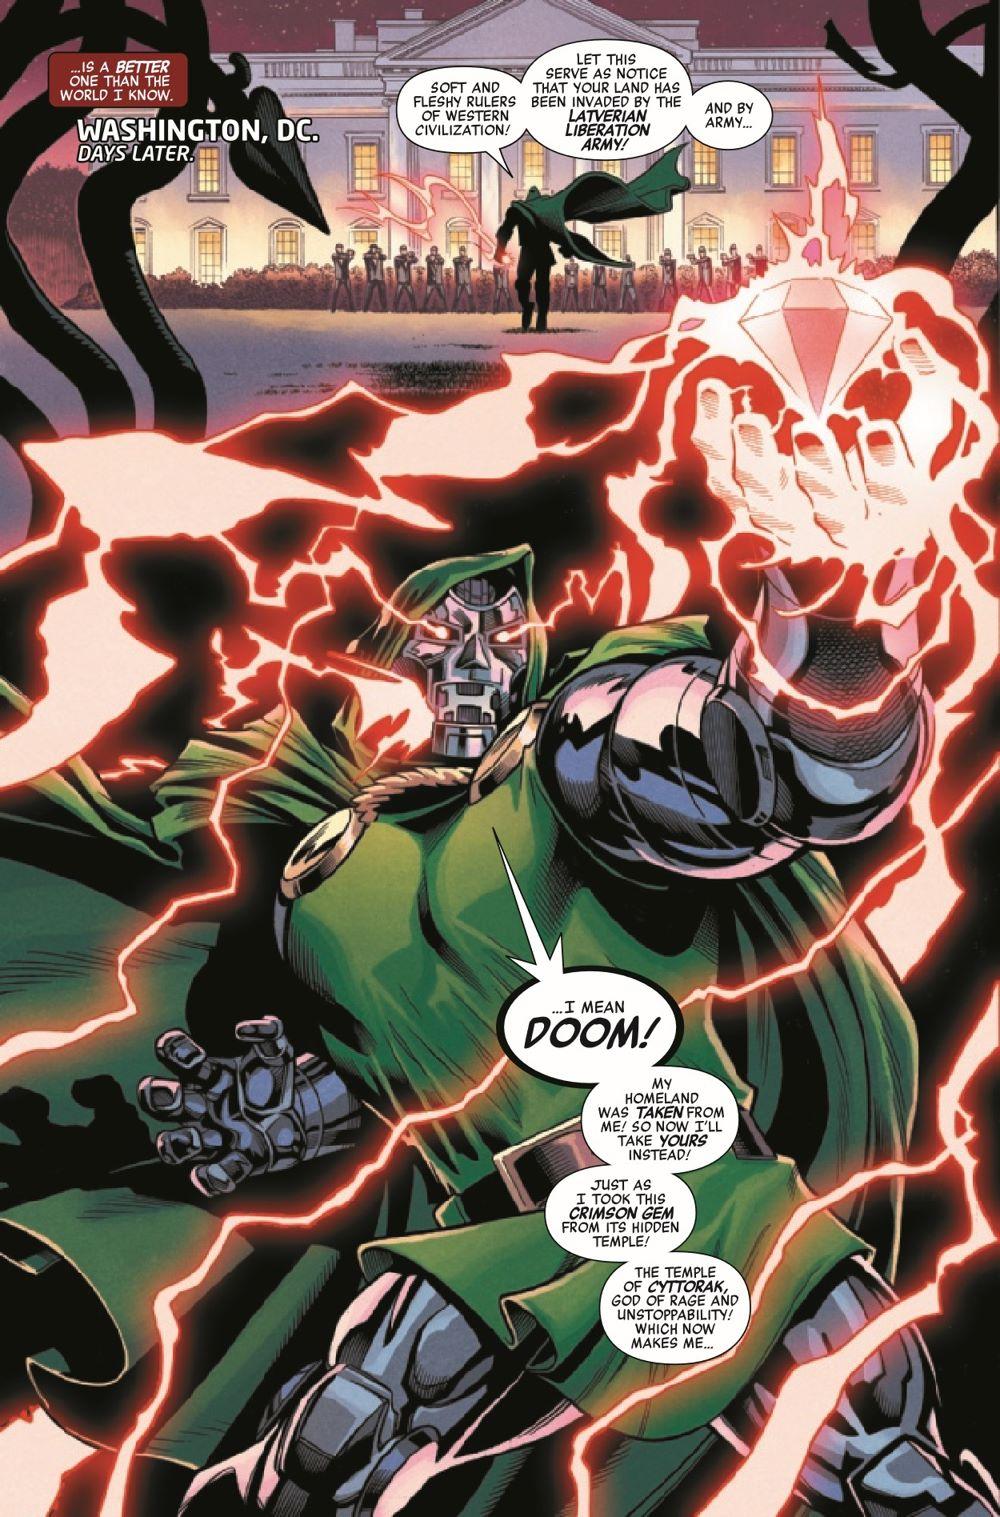 HEROESREBORN2021001_Preview-4 ComicList Previews: HEROES REBORN #1 (OF 7)